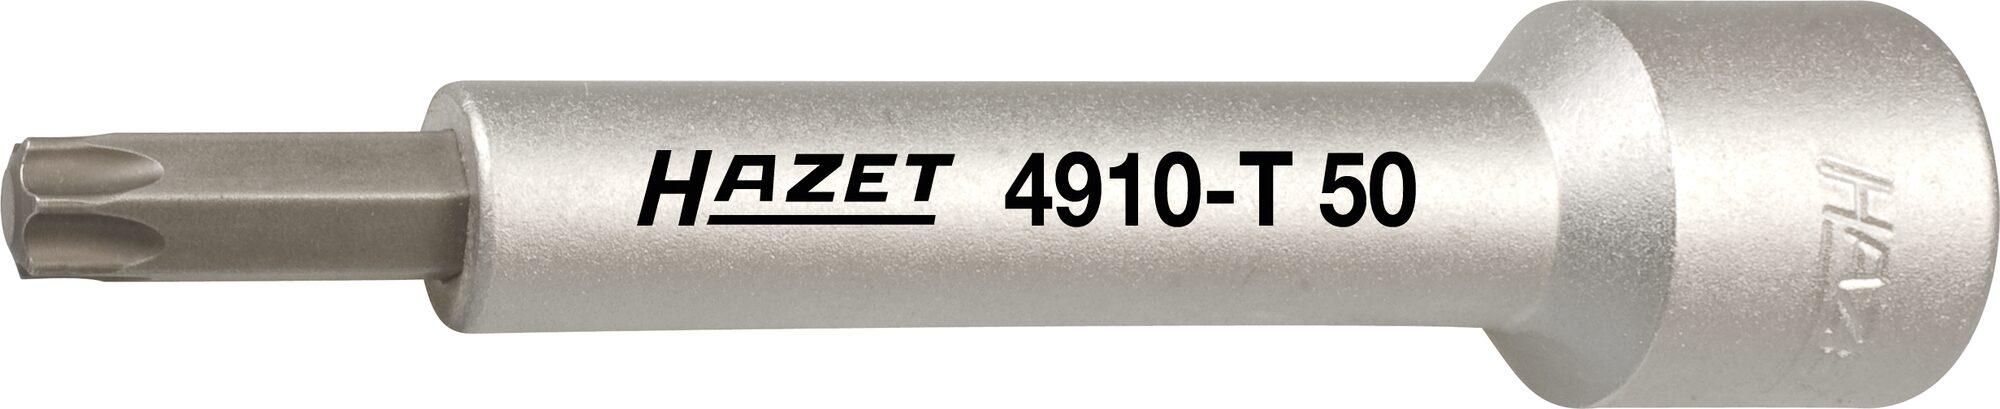 HAZET Gegenhalter für Kolbenstange 4910-T50 ∙ Vierkant hohl 12,5 mm (1/2 Zoll) ∙ Innen TORX® Profil ∙ T50